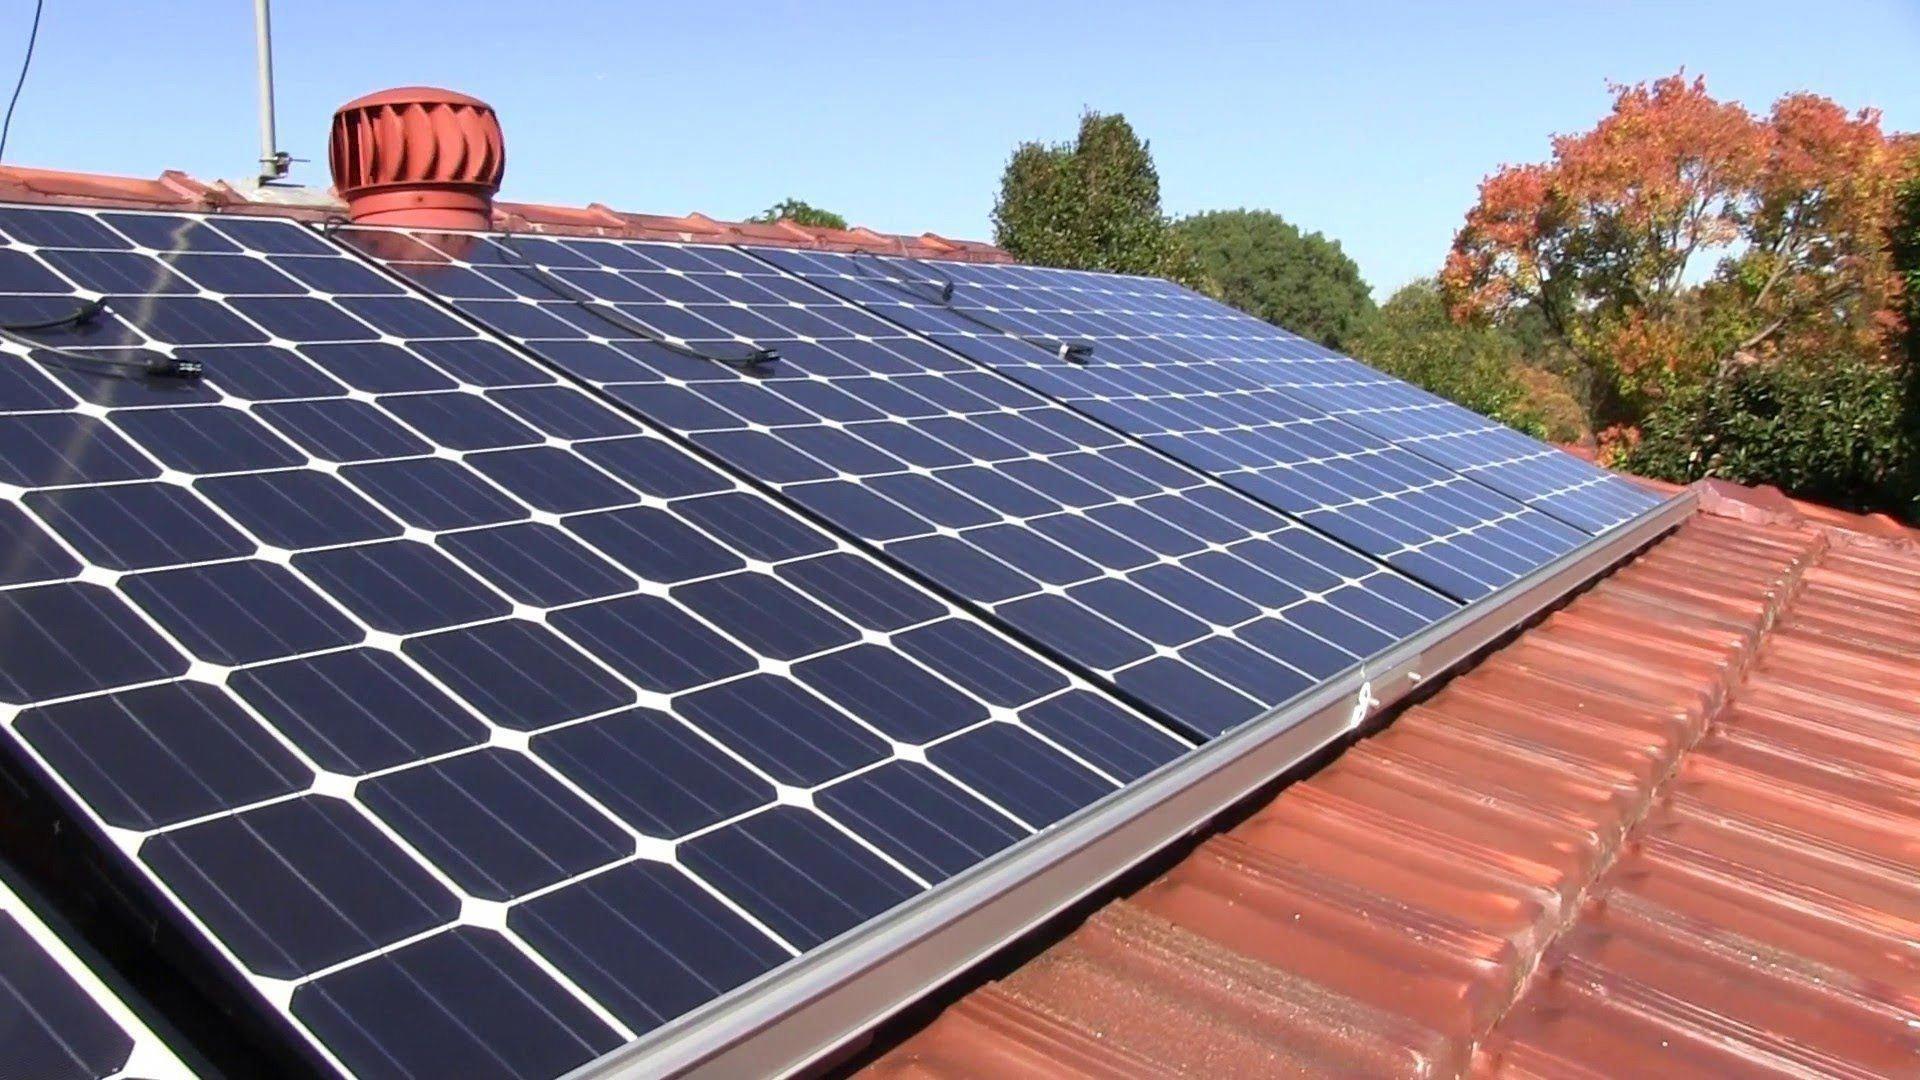 Solar Panel Installation In Uganda Solarpanels Solarenergy Solarpower Solargenerator Solarpanelkits So Solar Panels Solar Power House Solar Panel Installation